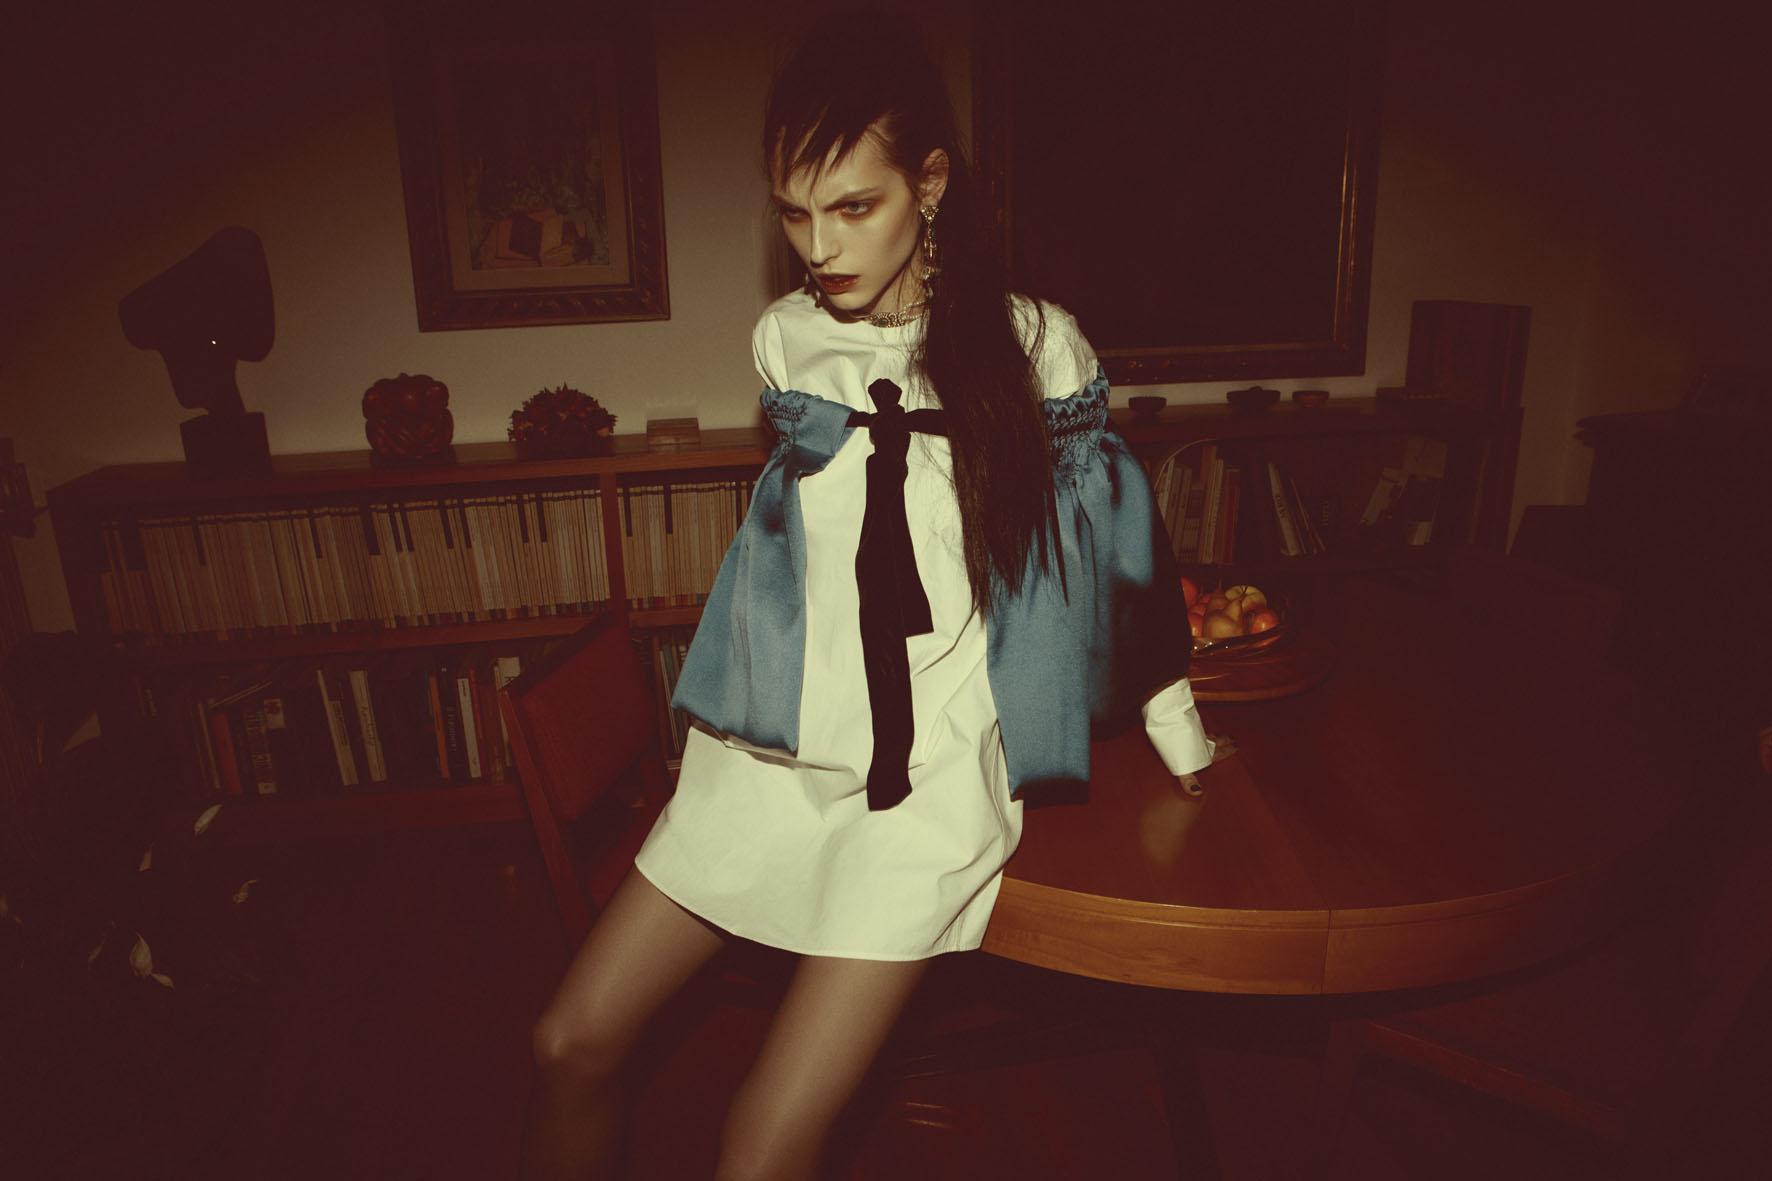 Karlina Caune by Alessio Bolzoni (Miu Miu - Lurve #6 Winter 2012-2013) 5.jpg